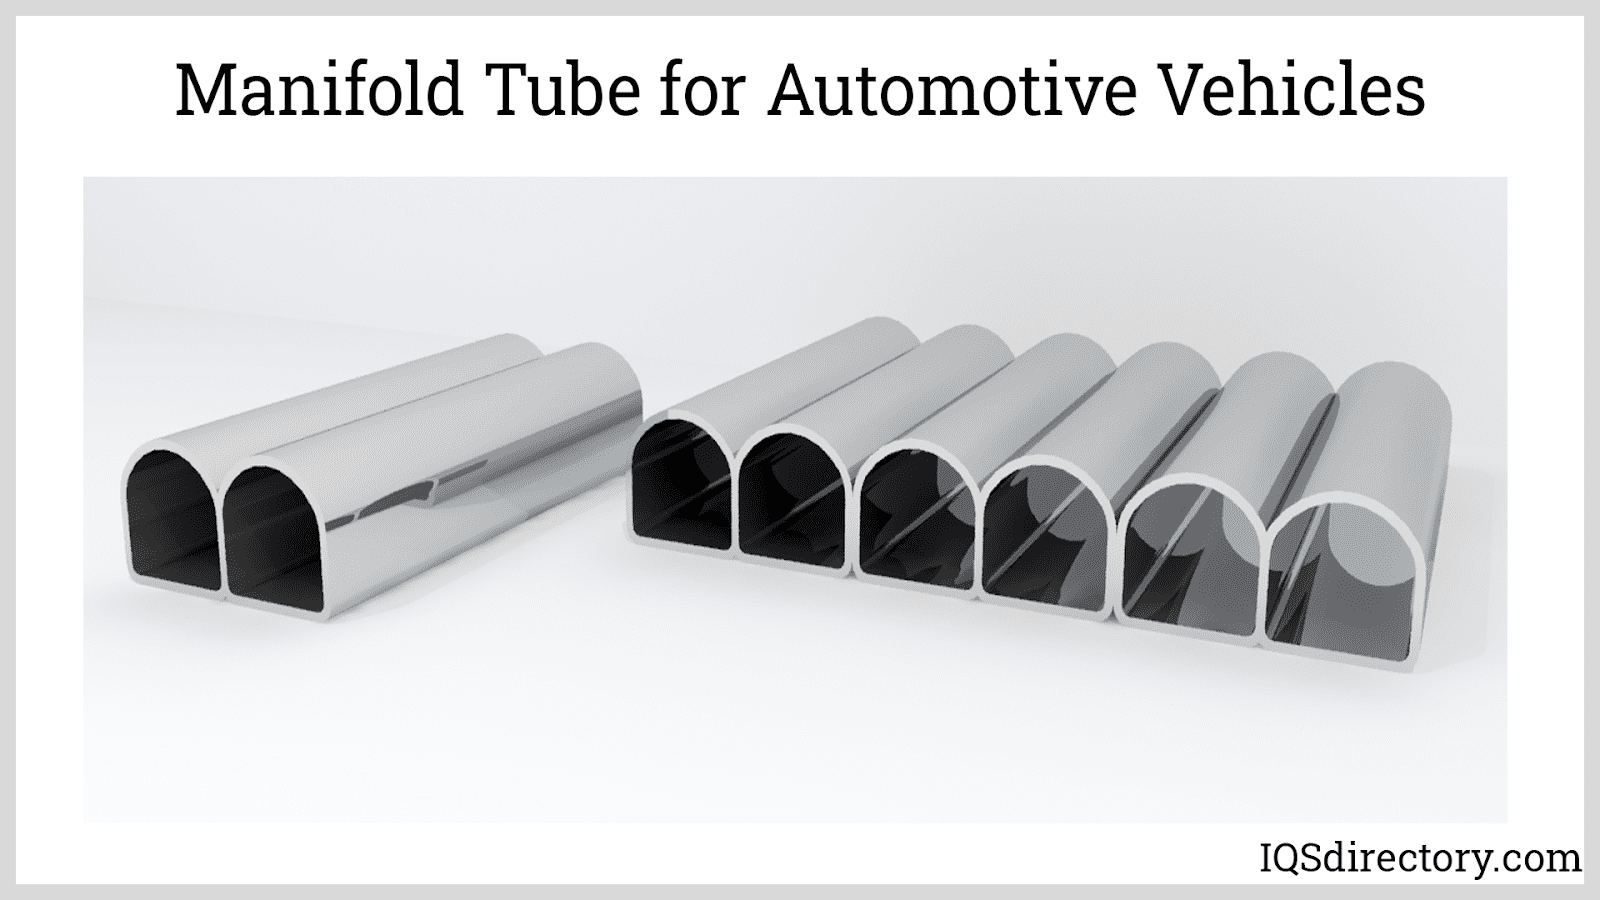 Manifold Tube for Automotive Vehicles